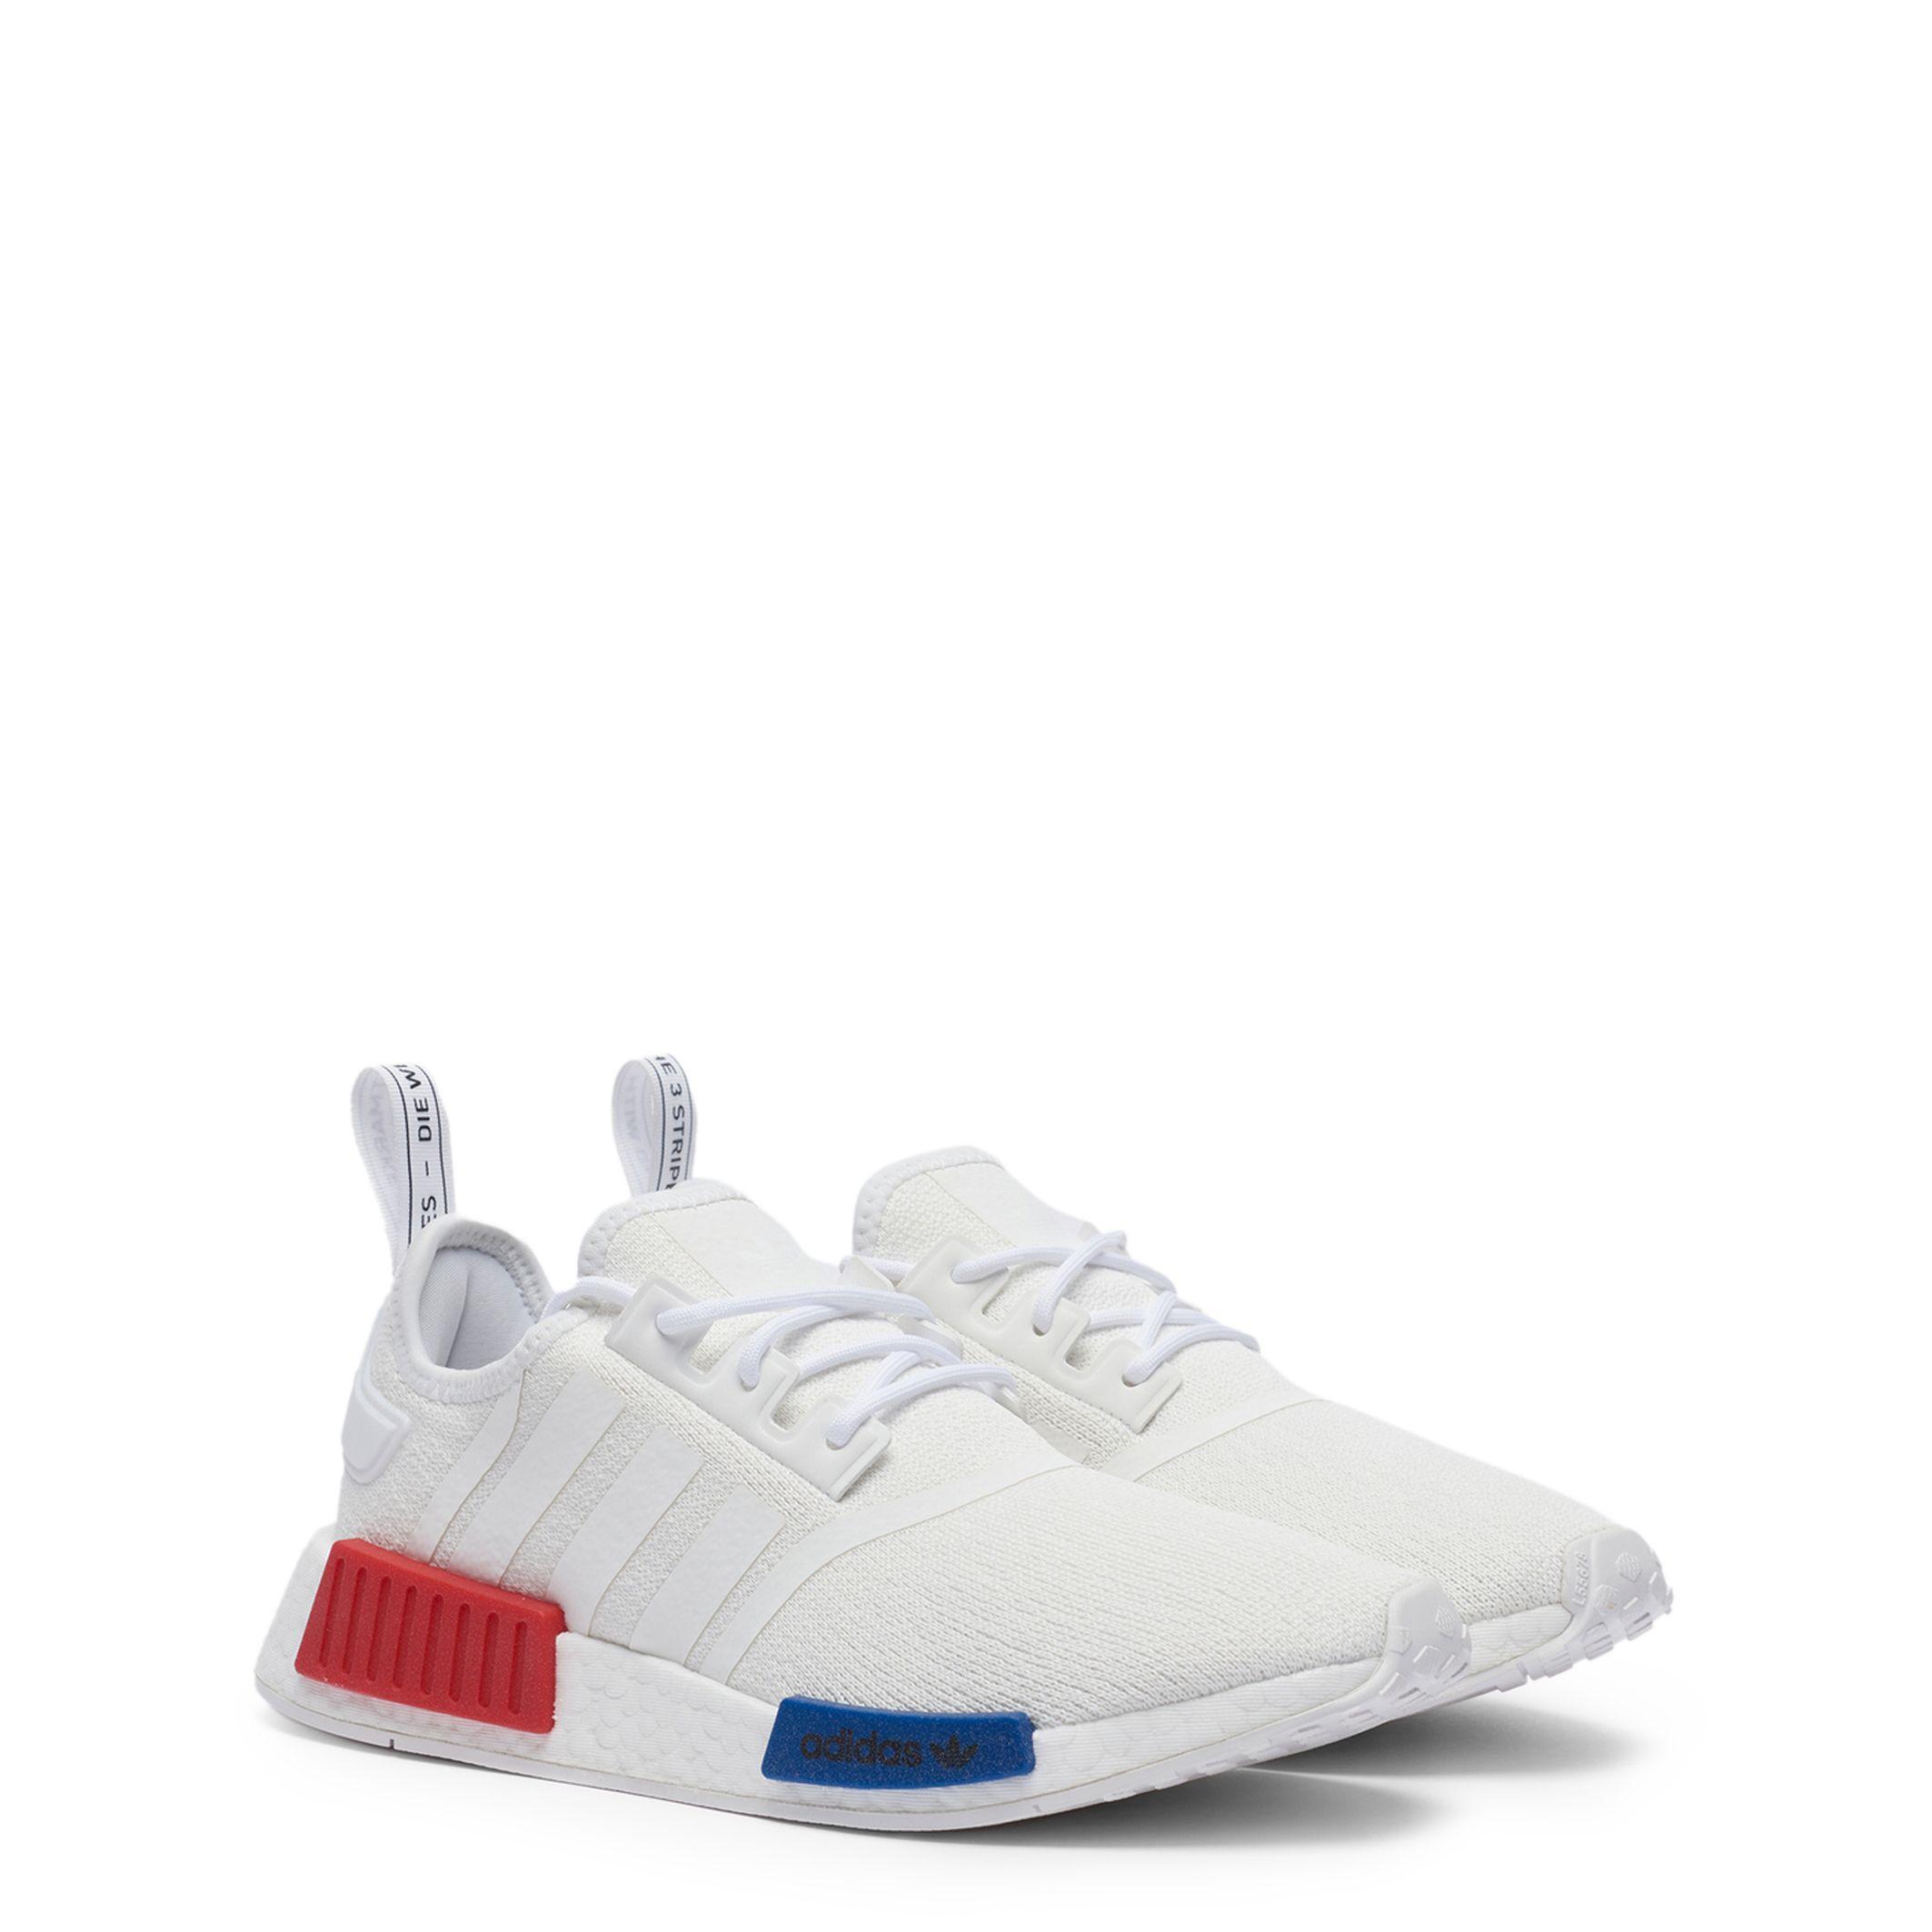 Adidas – NMD_R1 – Blanco